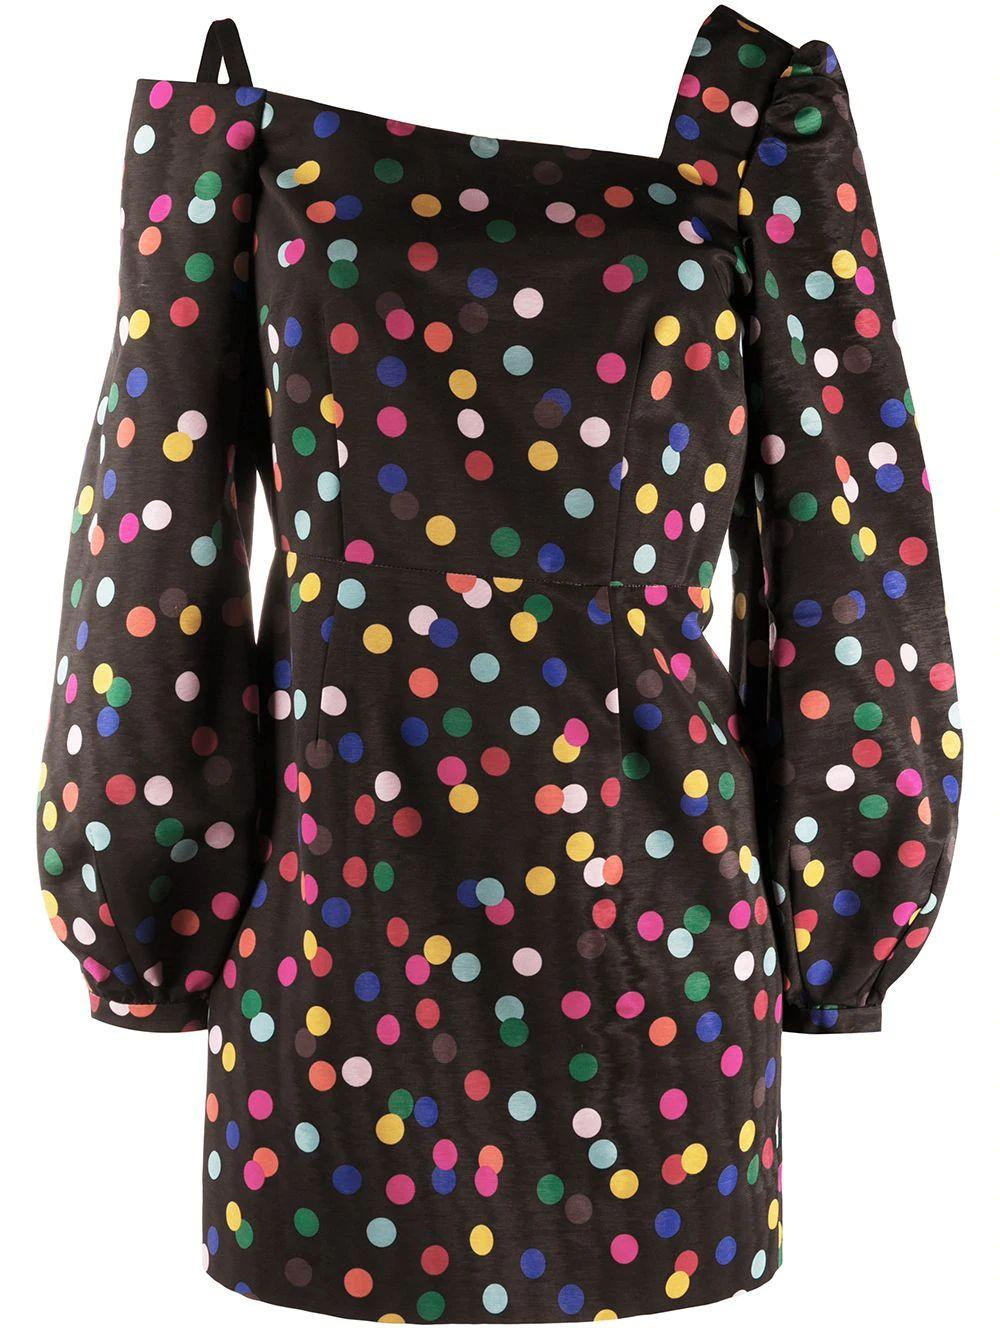 Debbie Moire Polka Dot Party Dress Item # RS10-D5-F